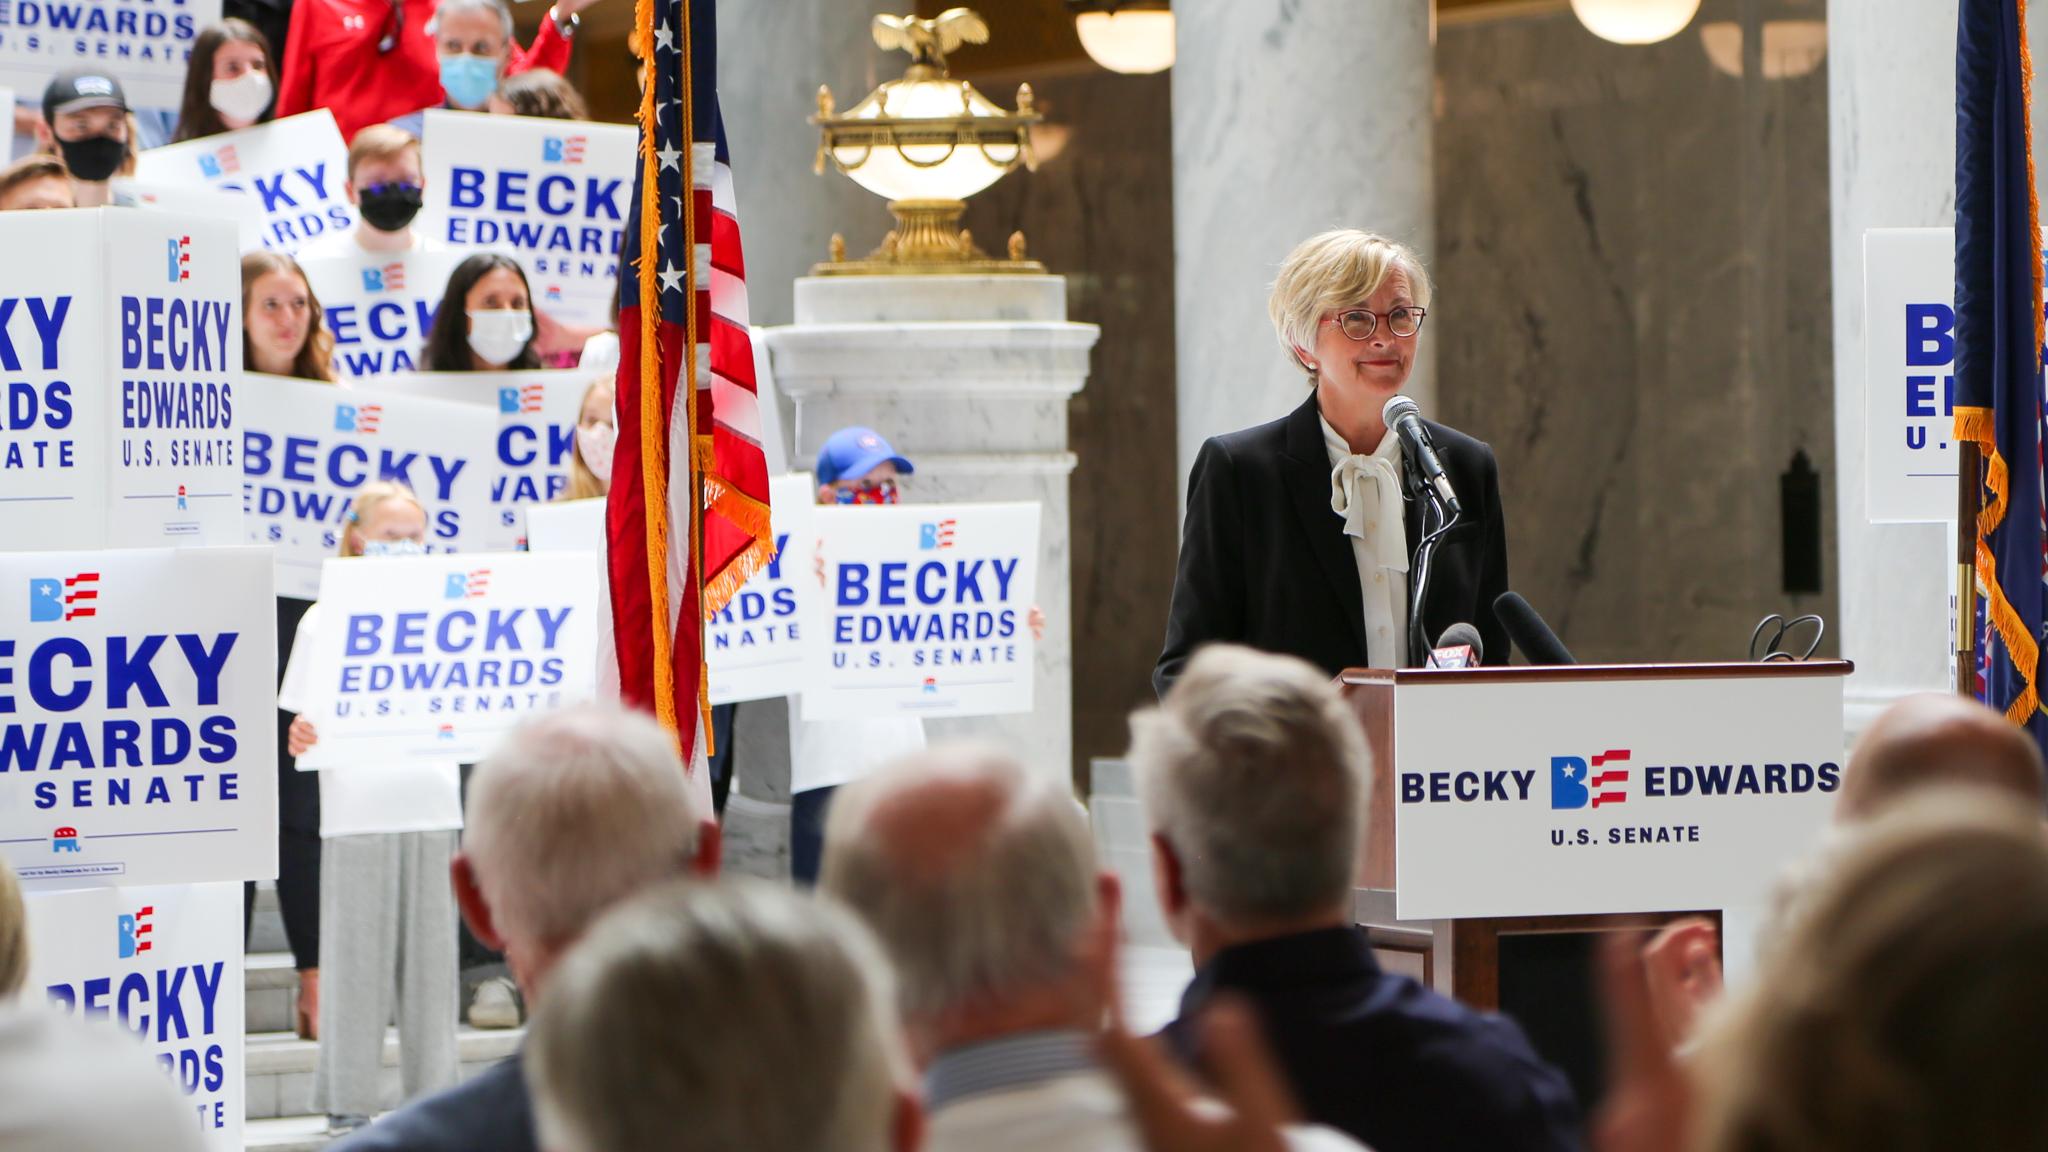 https://beckyforutah.com/wp-content/uploads/2021/07/Becky-Edwards-for-US-Senate-Launch-043-4.jpg